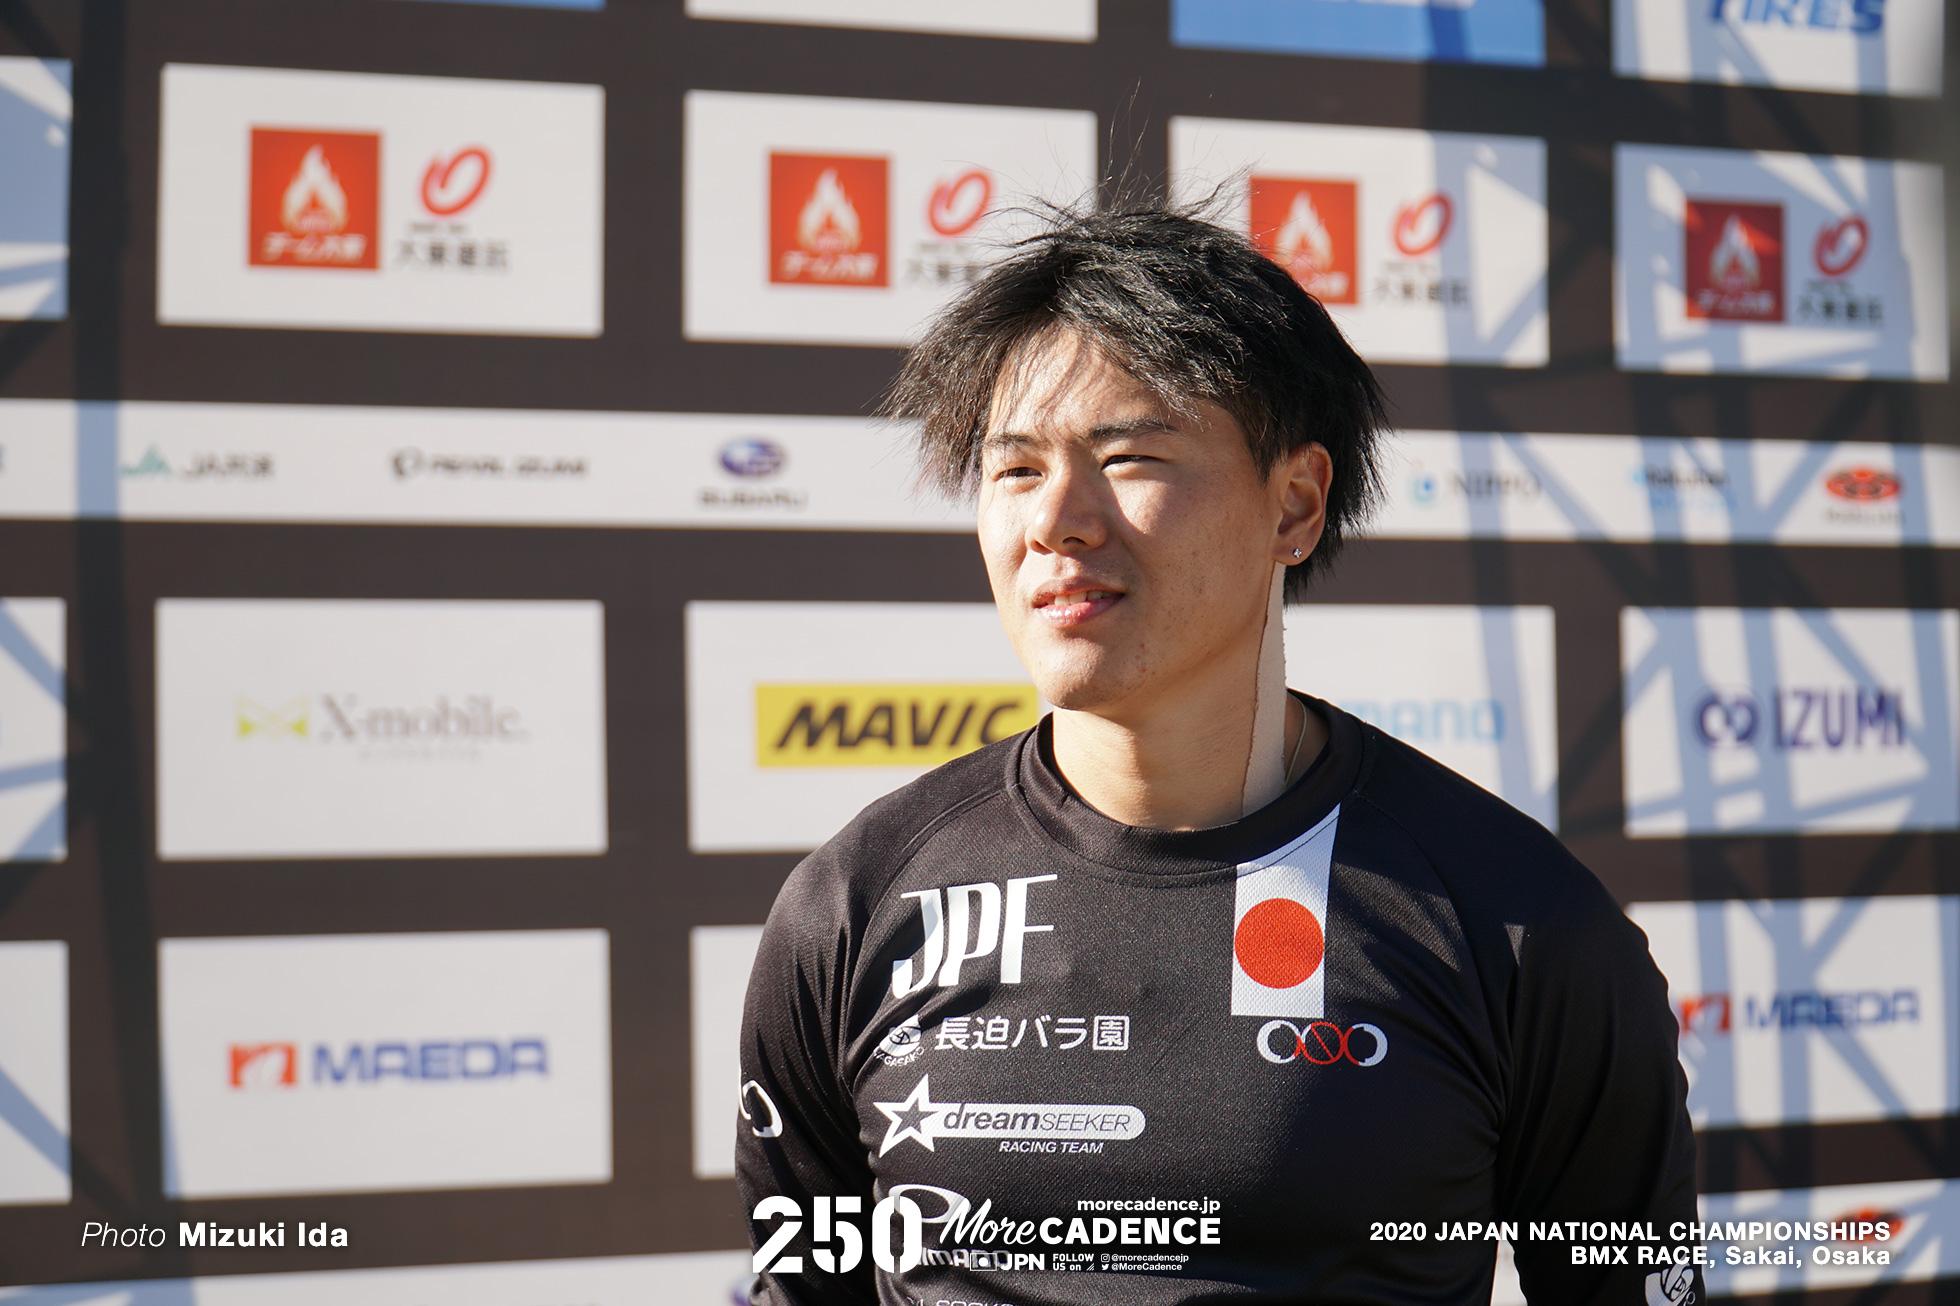 長迫吉拓 Yoshitaku Nagasako, 2020全日本選手権BMXレース